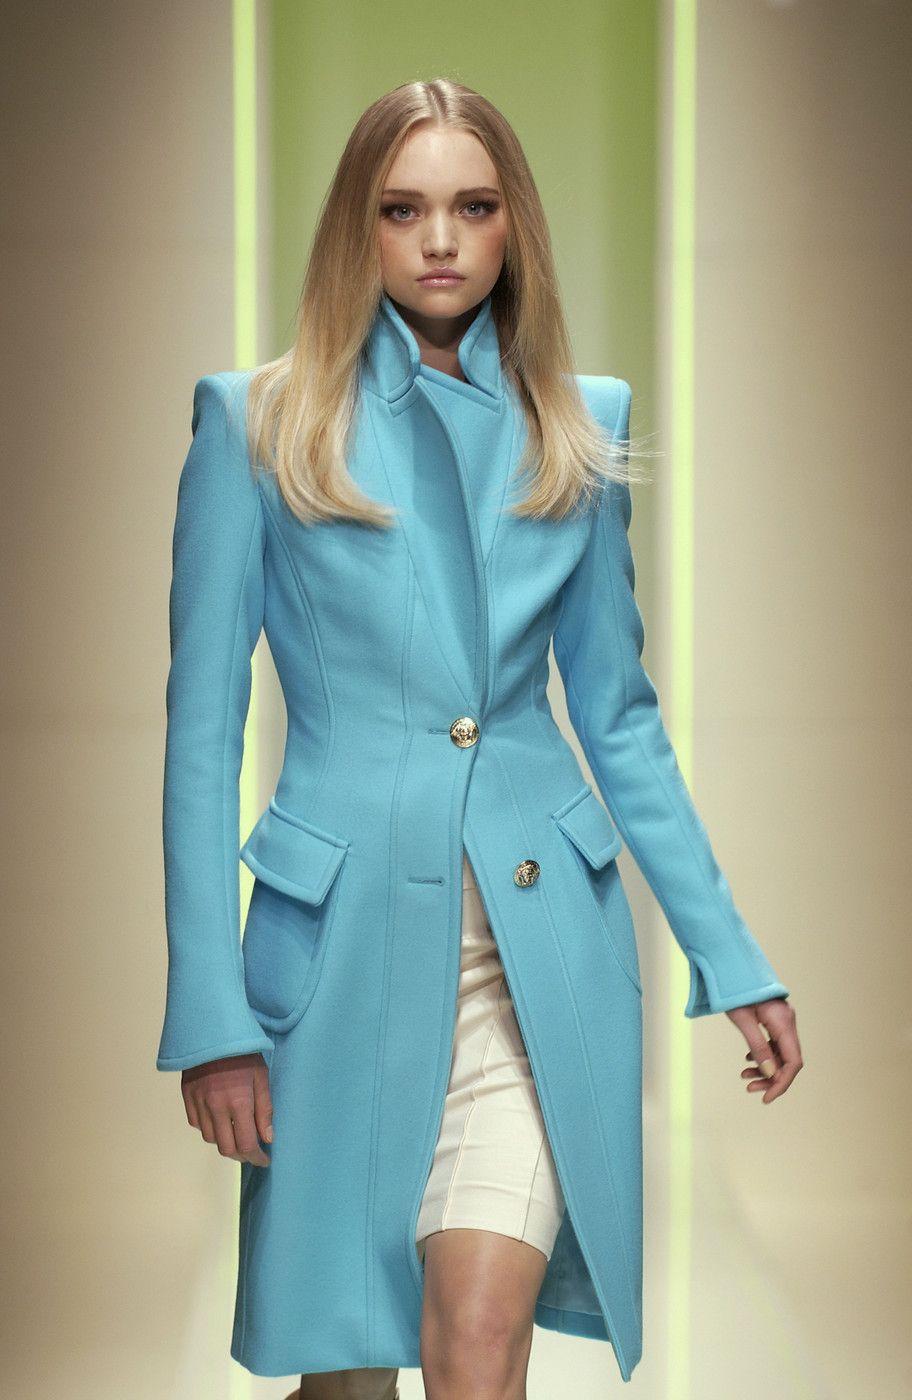 ZsaZsa Bellagio – Like No Other: Fashion & Glamour Please